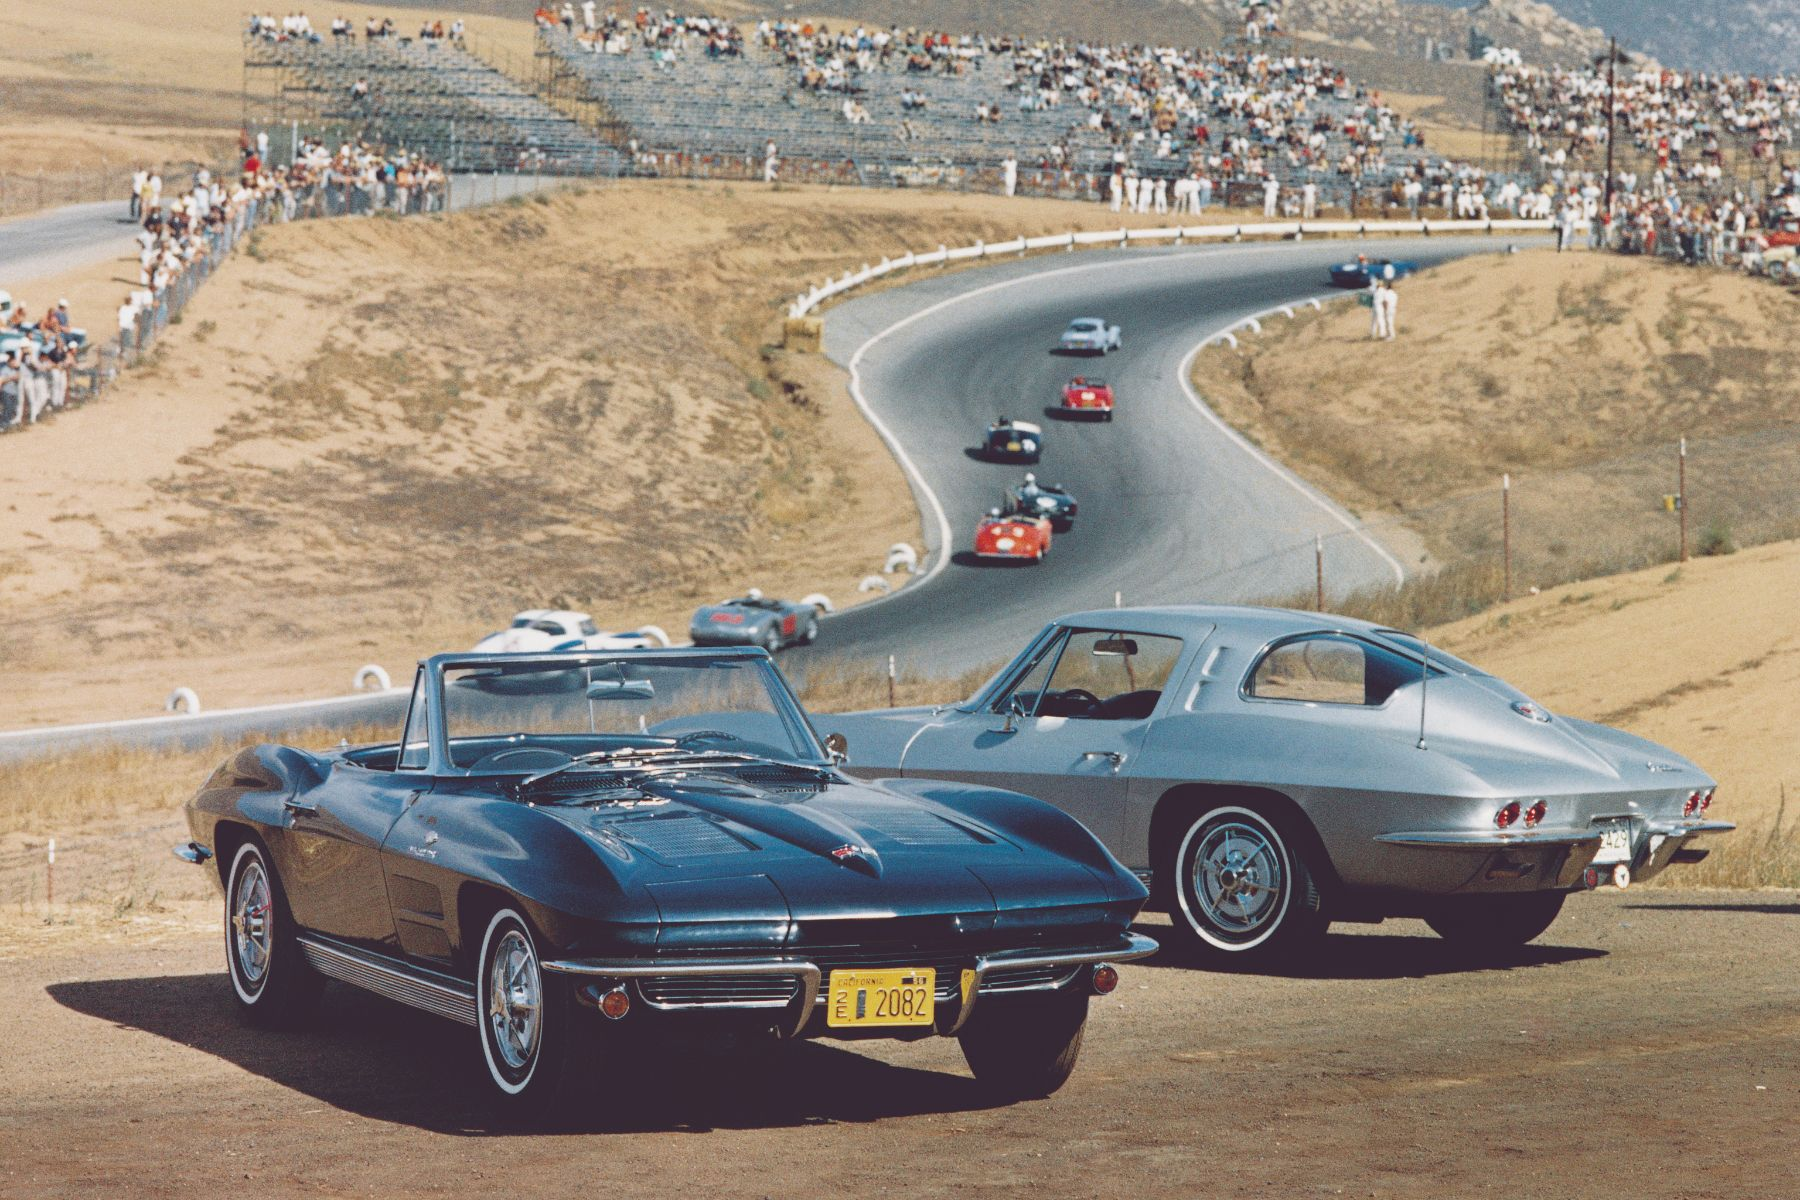 chevrolet corvette sting ray 40